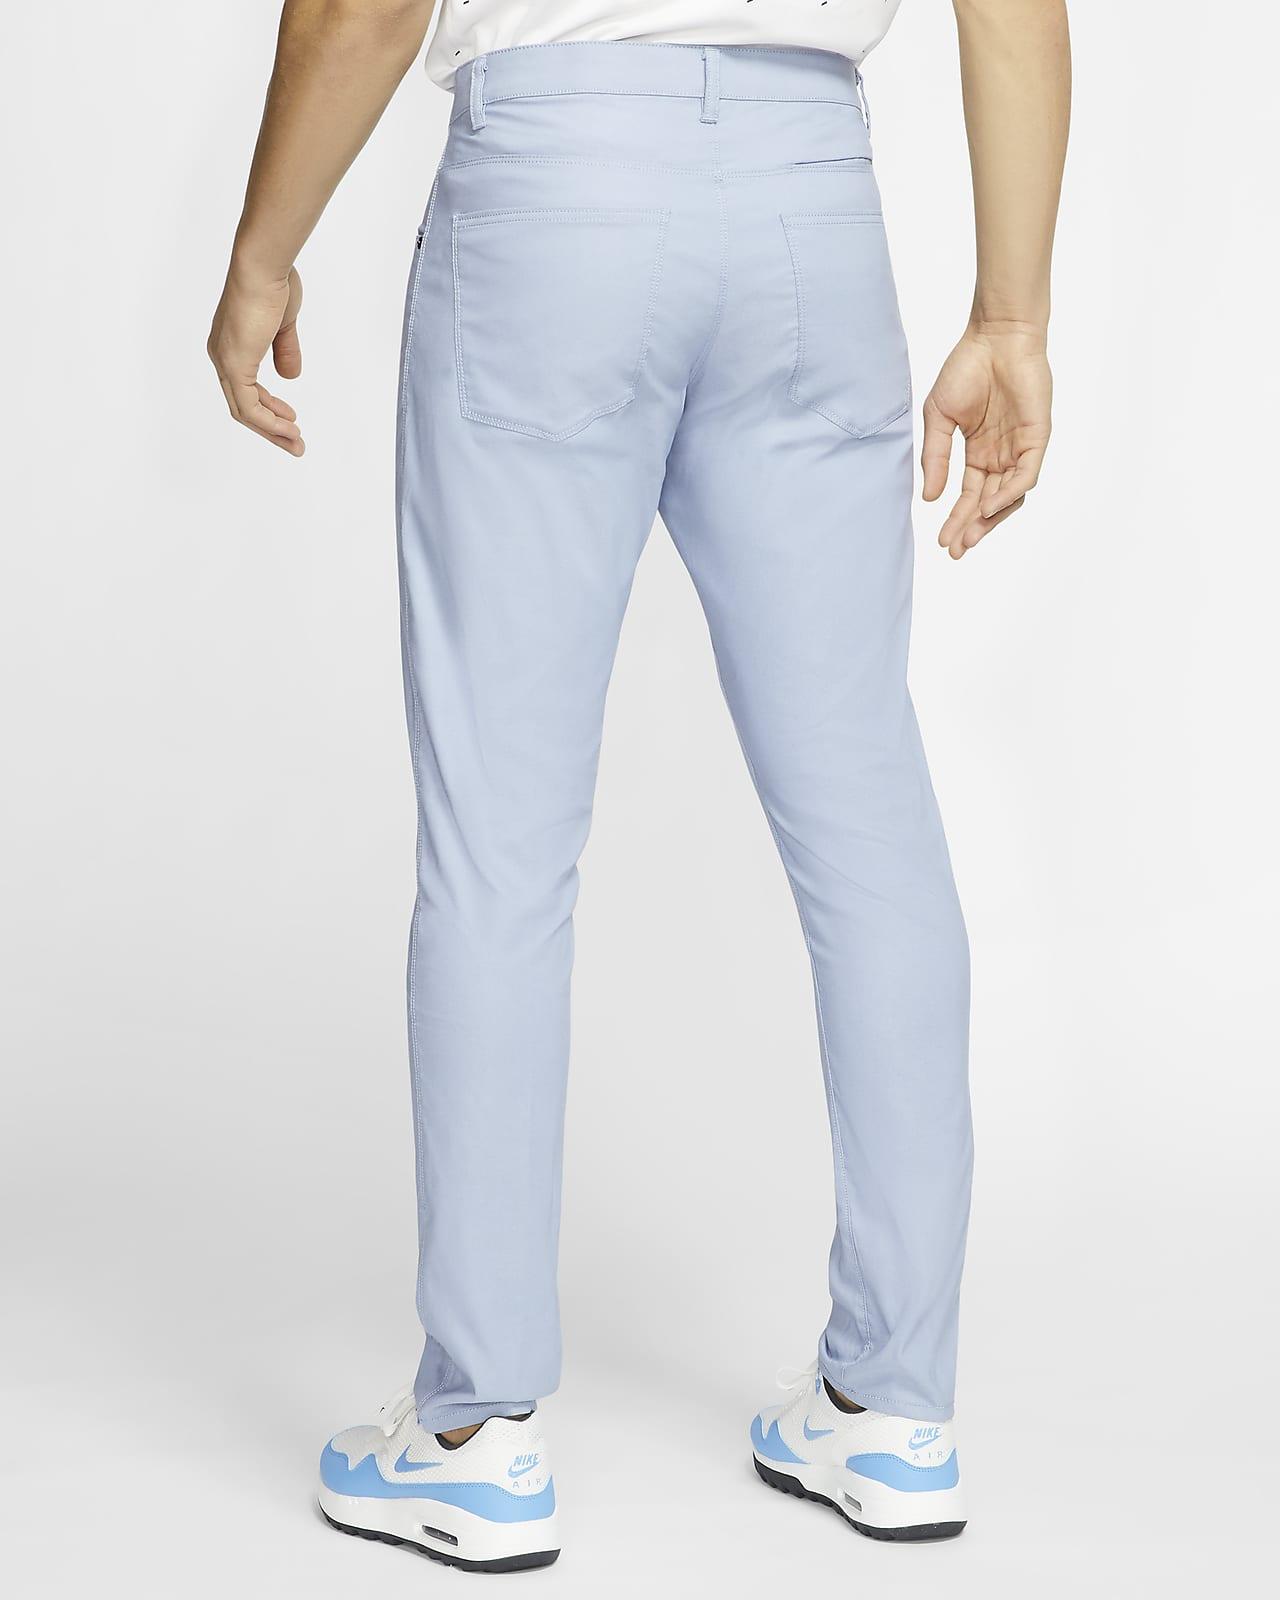 حزن صف دراسي الضباب الدخاني Pantalones Para Golf Hombre 14thbrooklyn Org